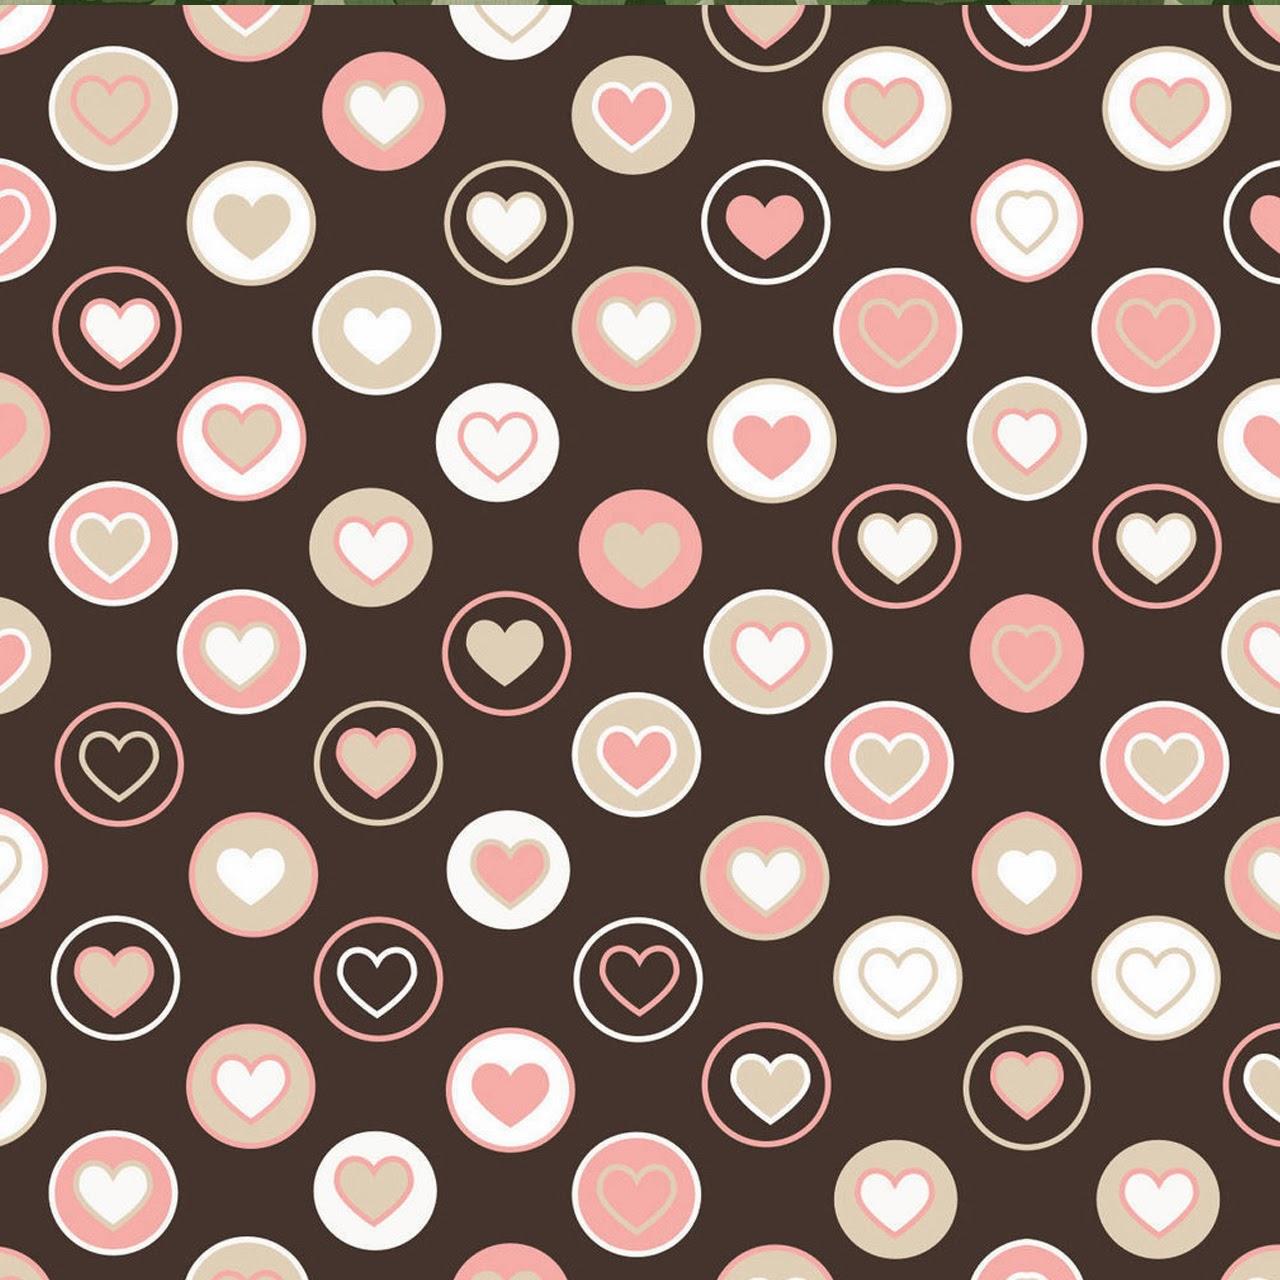 ImagesList.com: Hearts Wallpapers, Part 5